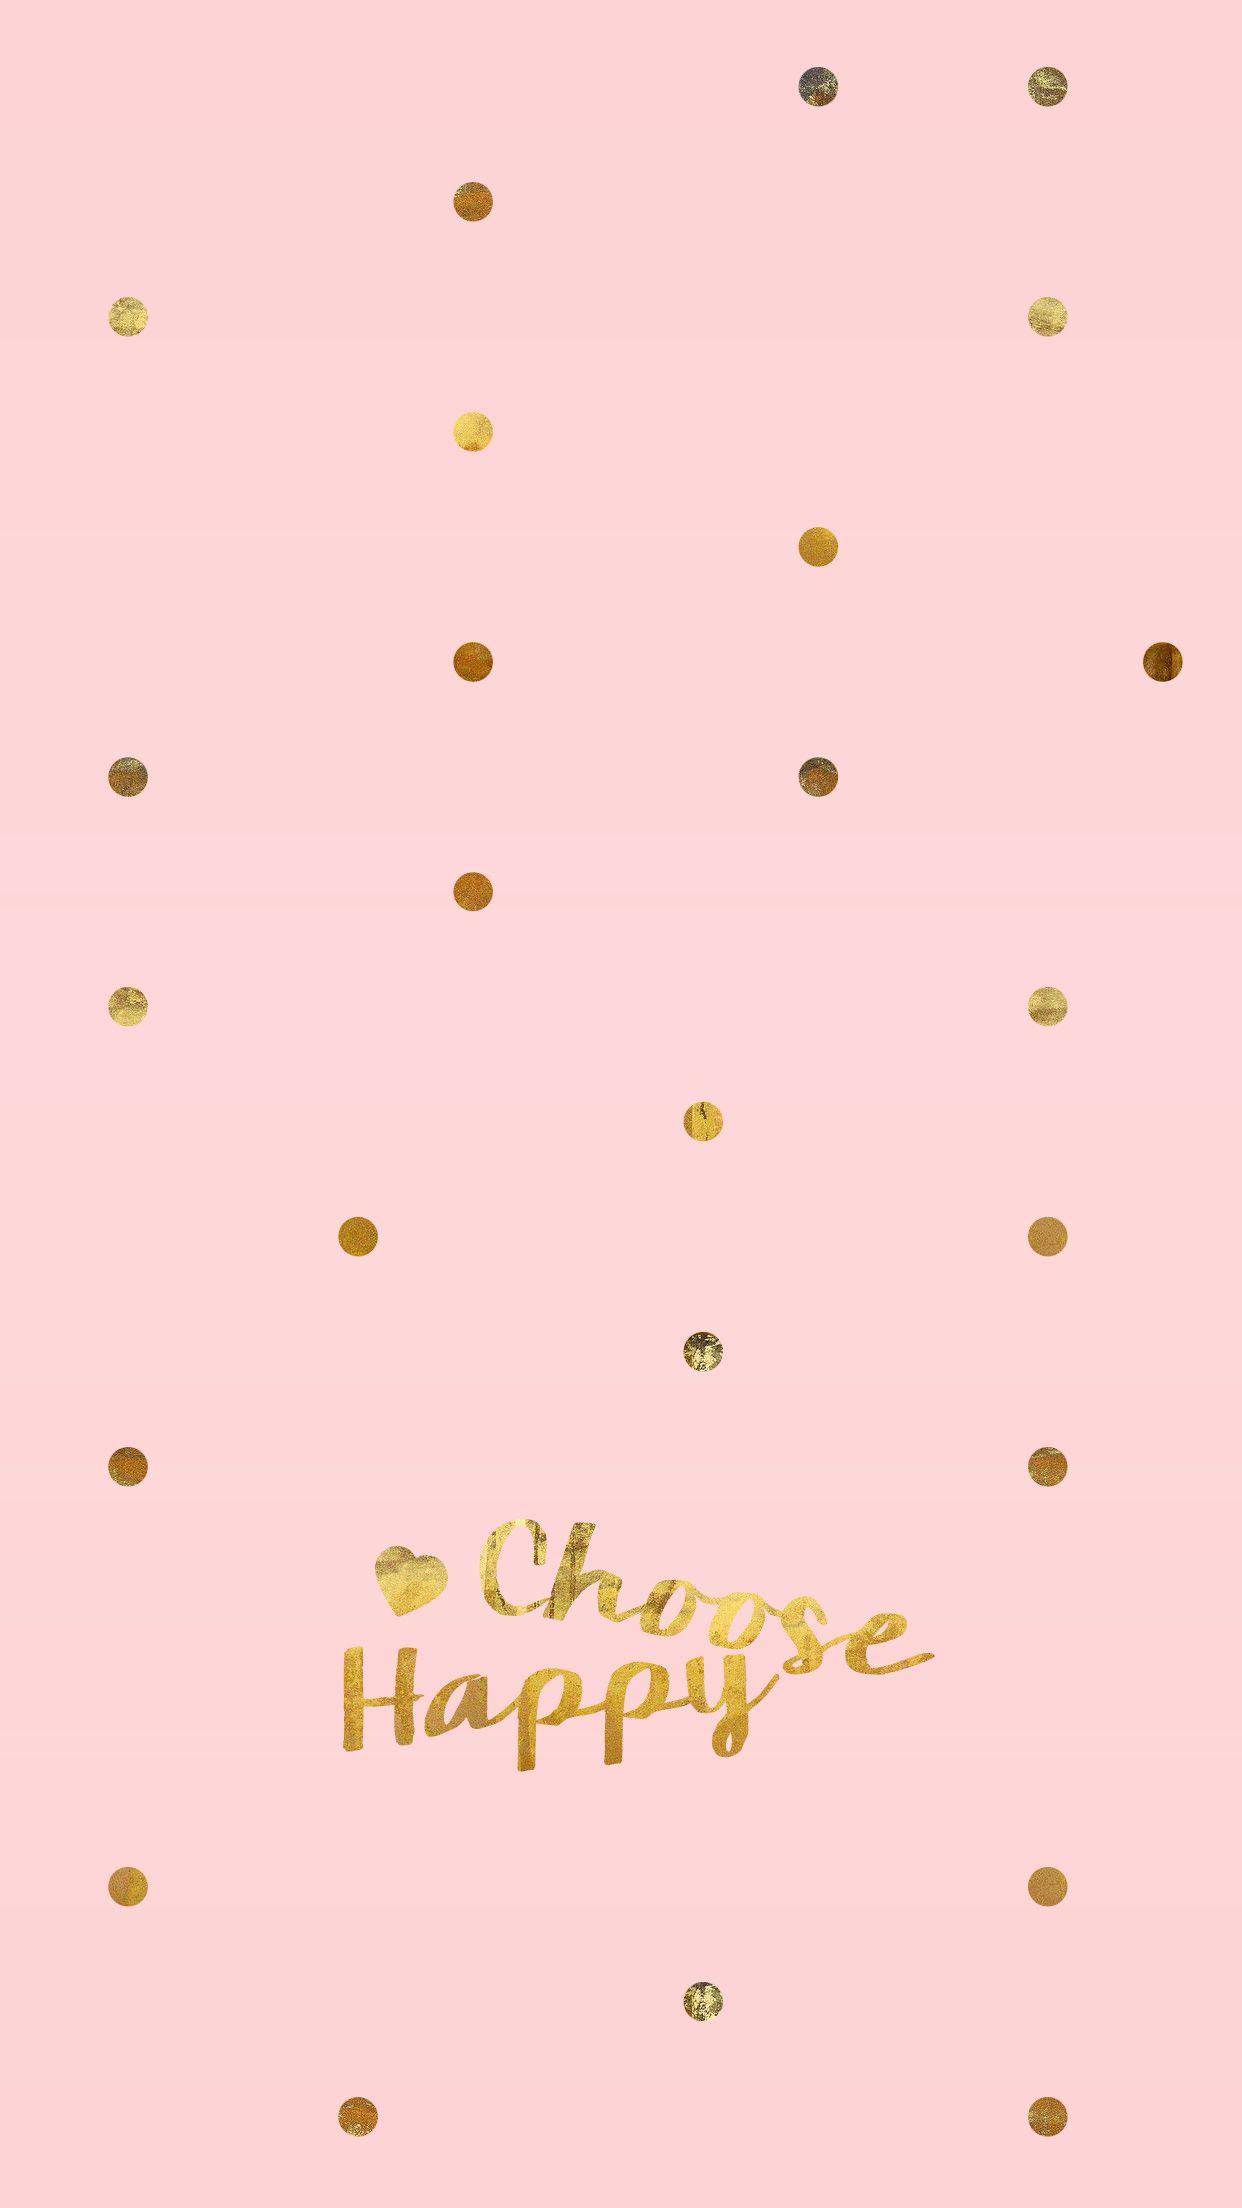 Choose Happy Blush Pink Iphone Wallpaper Background Iphone Wallpaper Pink Wallpaper Iphone Pink Wallpaper